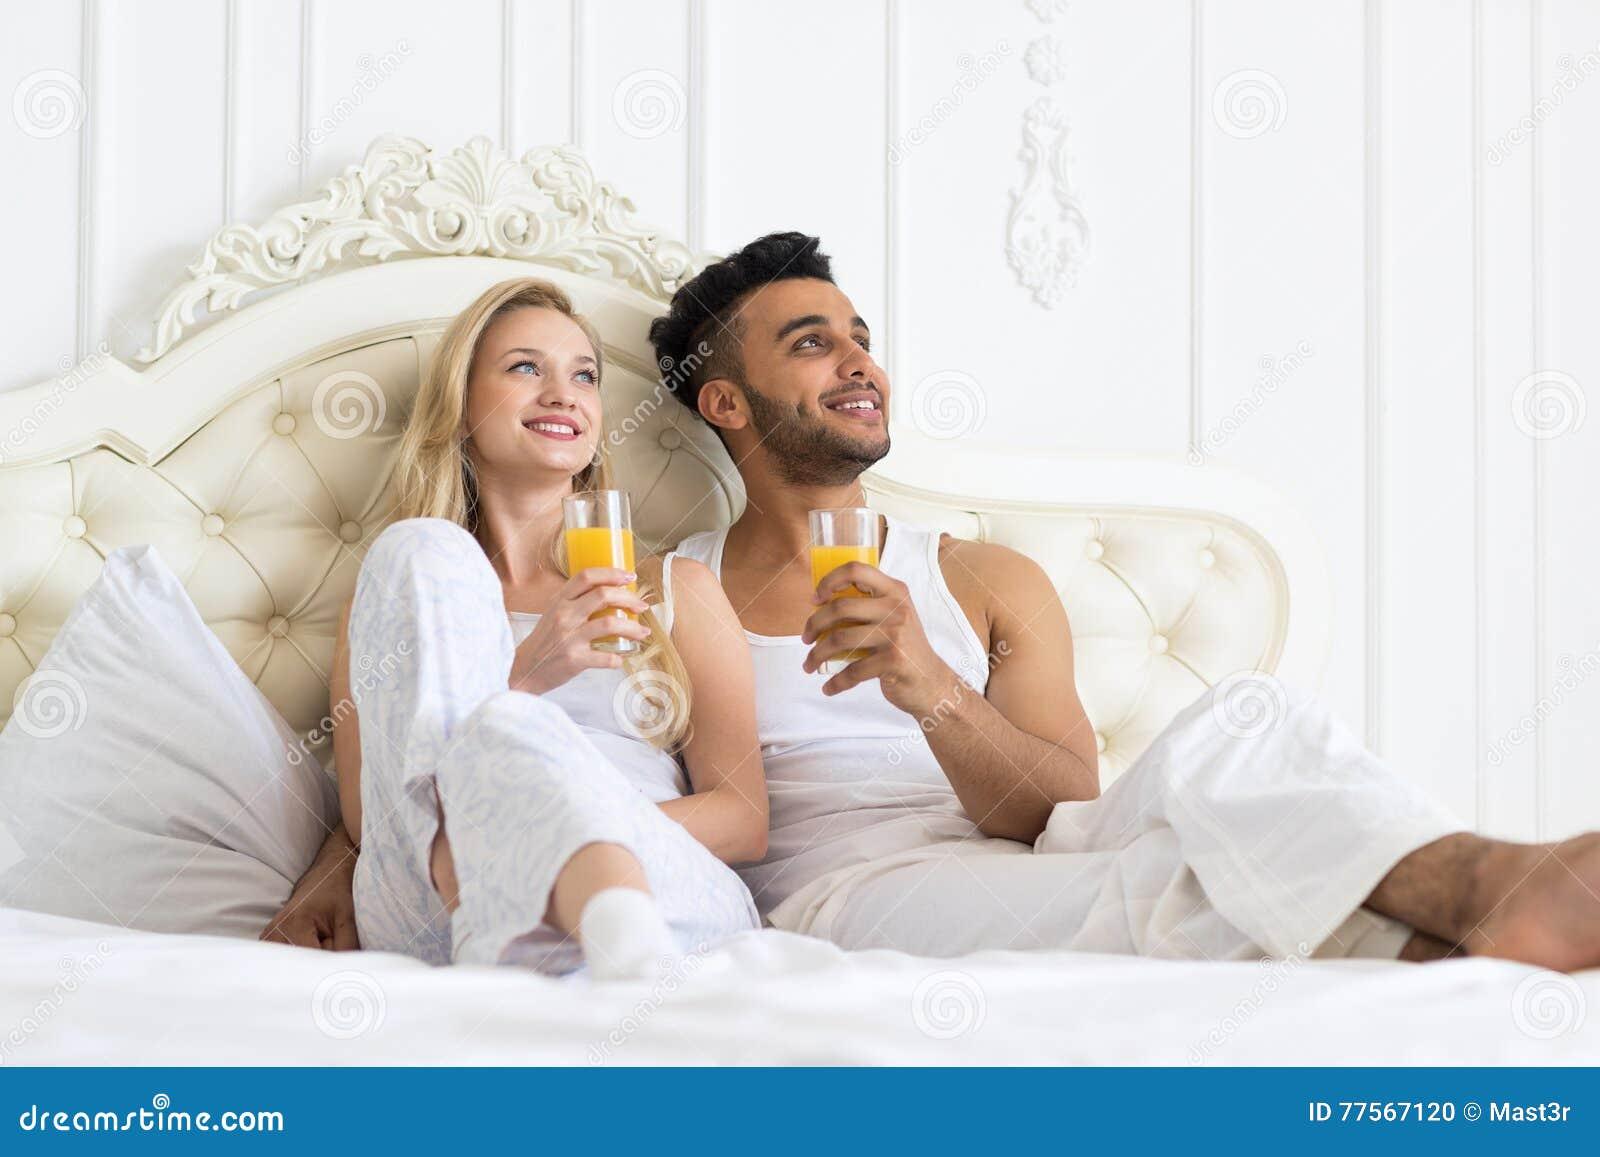 Image result for lovers drink juice